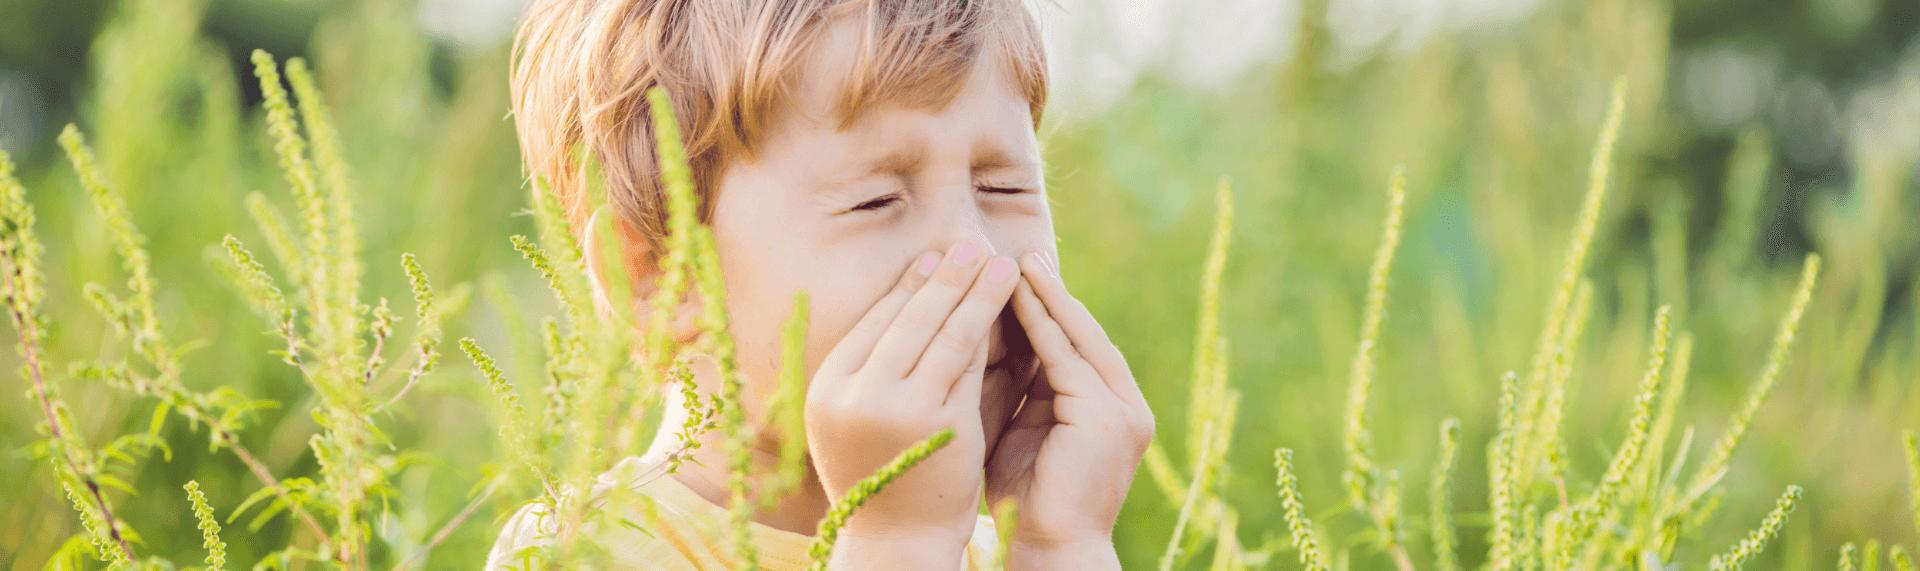 kid sneezing with ragweed around him